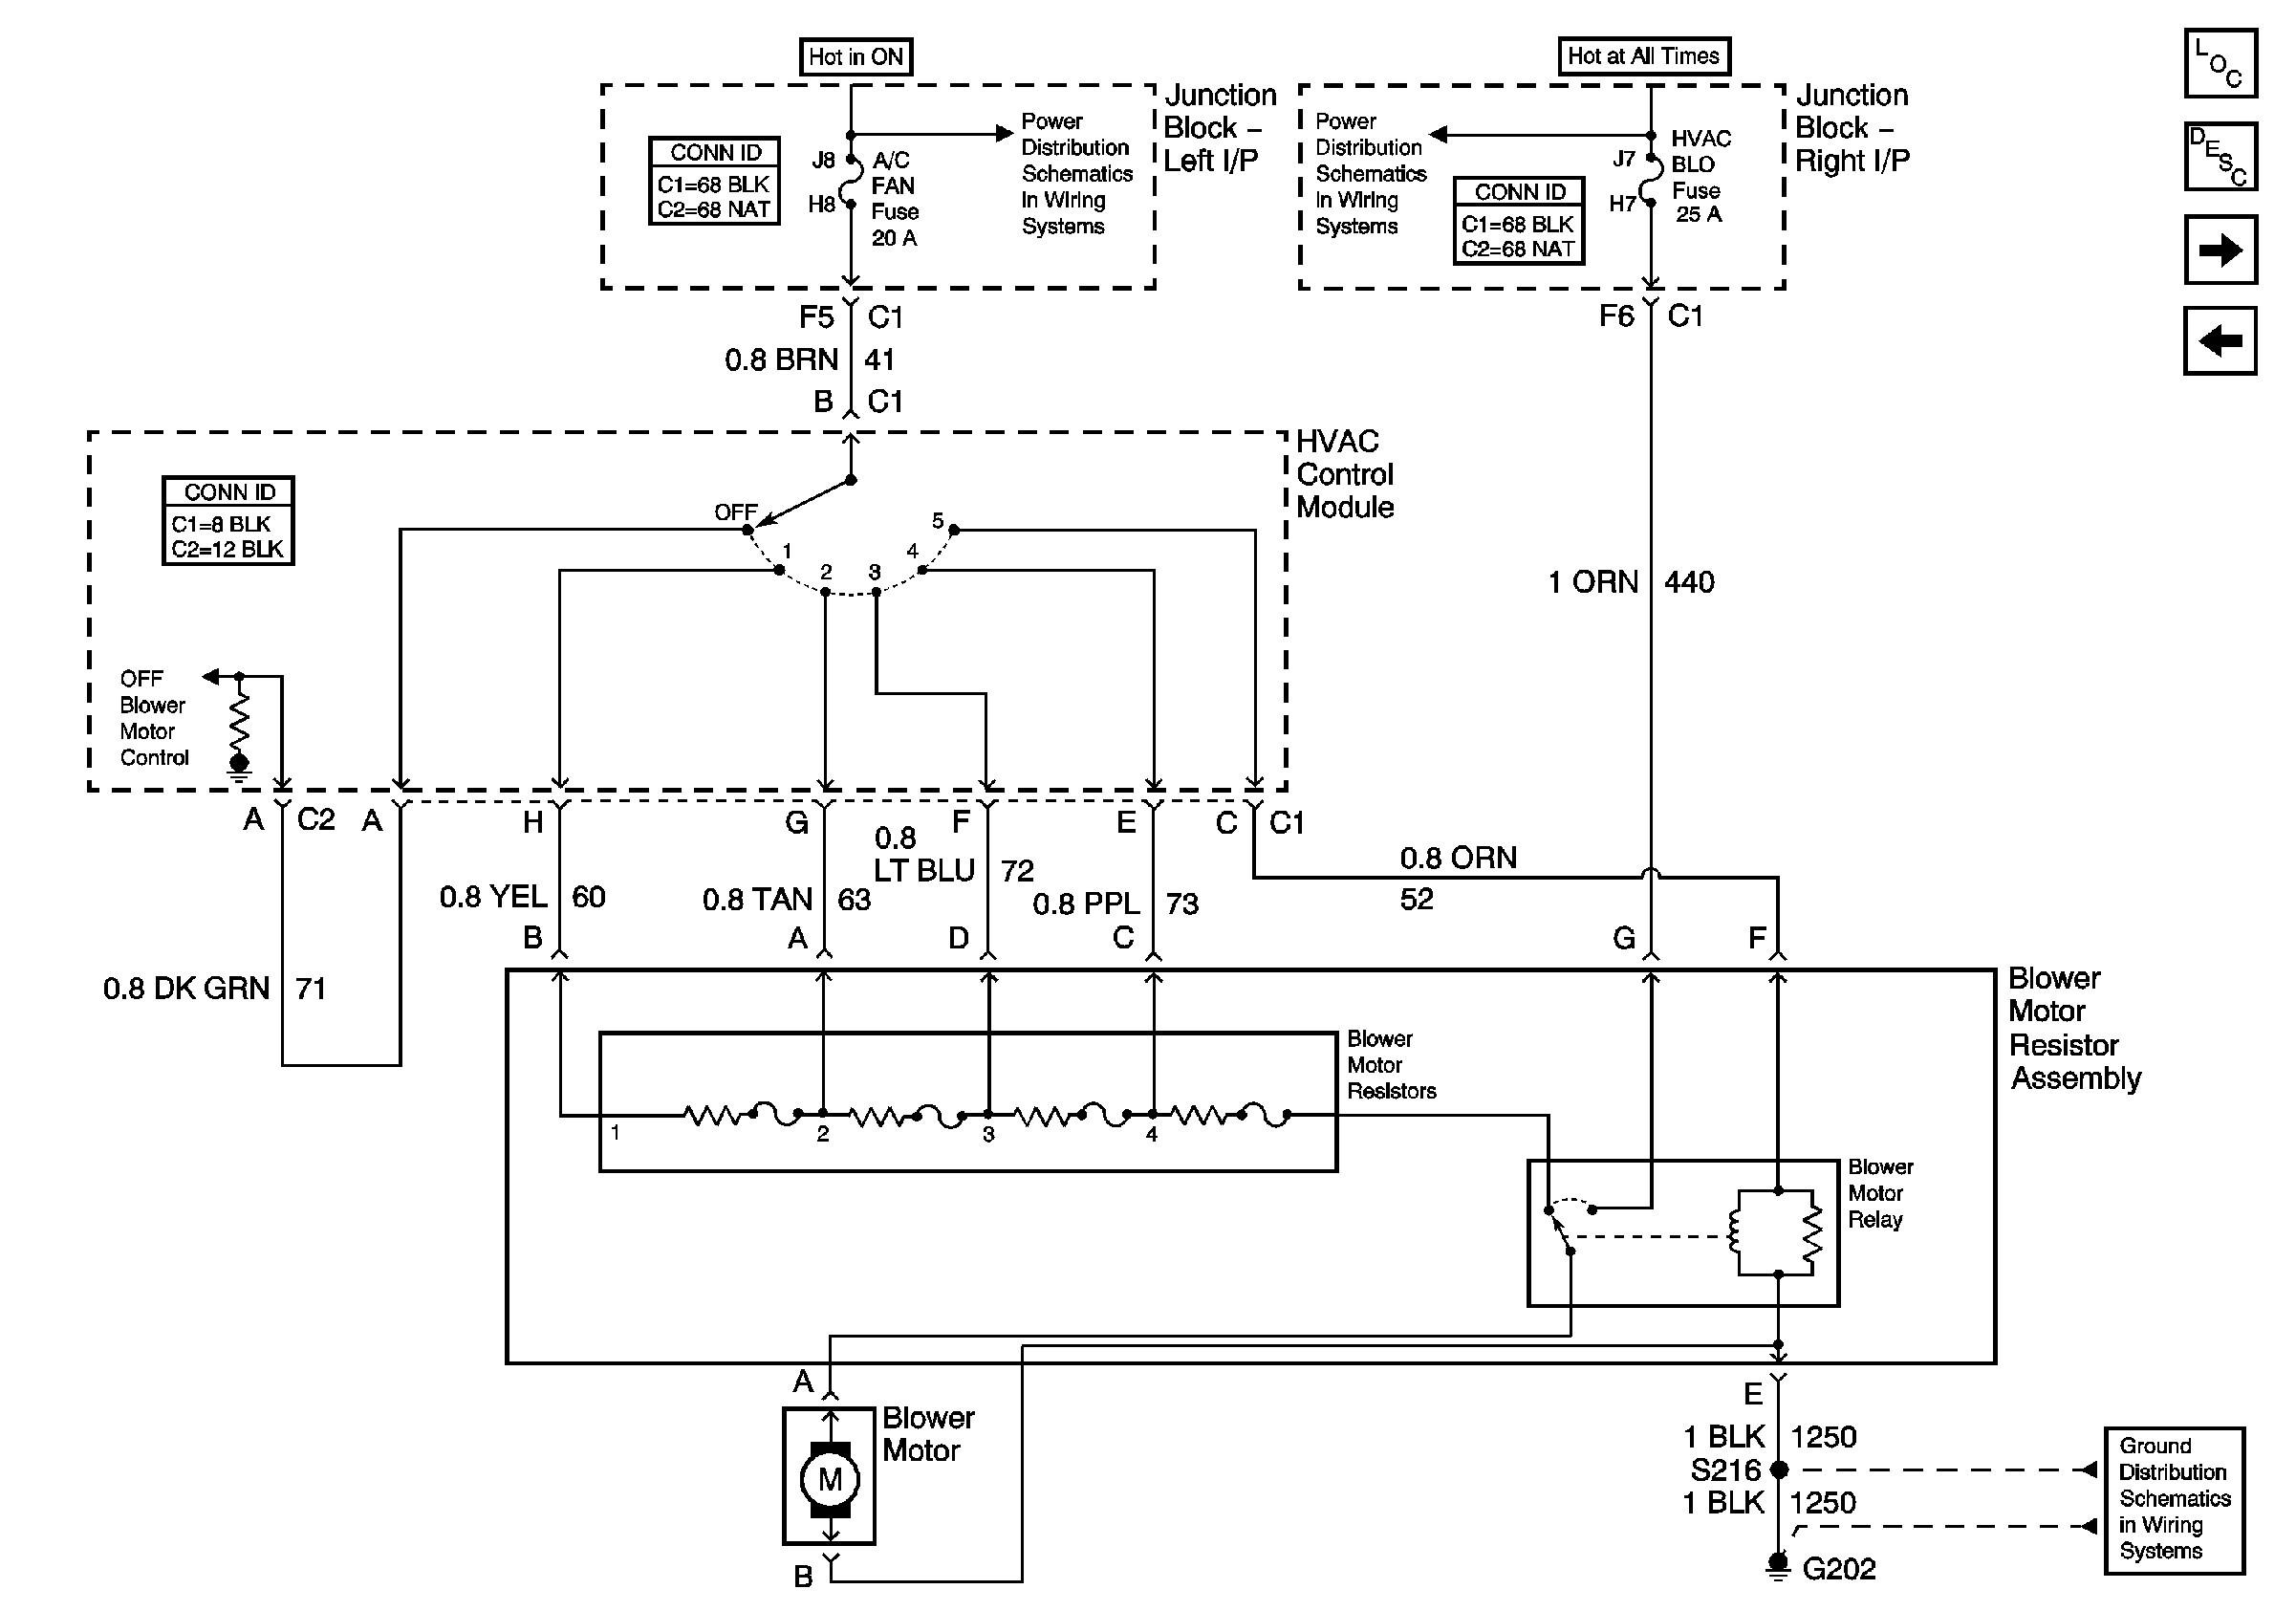 Factory Installed Wiring Schematic for A 2004 Gmc Trailer Diagram] 2006 Chevy Silverado Fan Wiring Diagram Full Hd Of Factory Installed Wiring Schematic for A 2004 Gmc Trailer